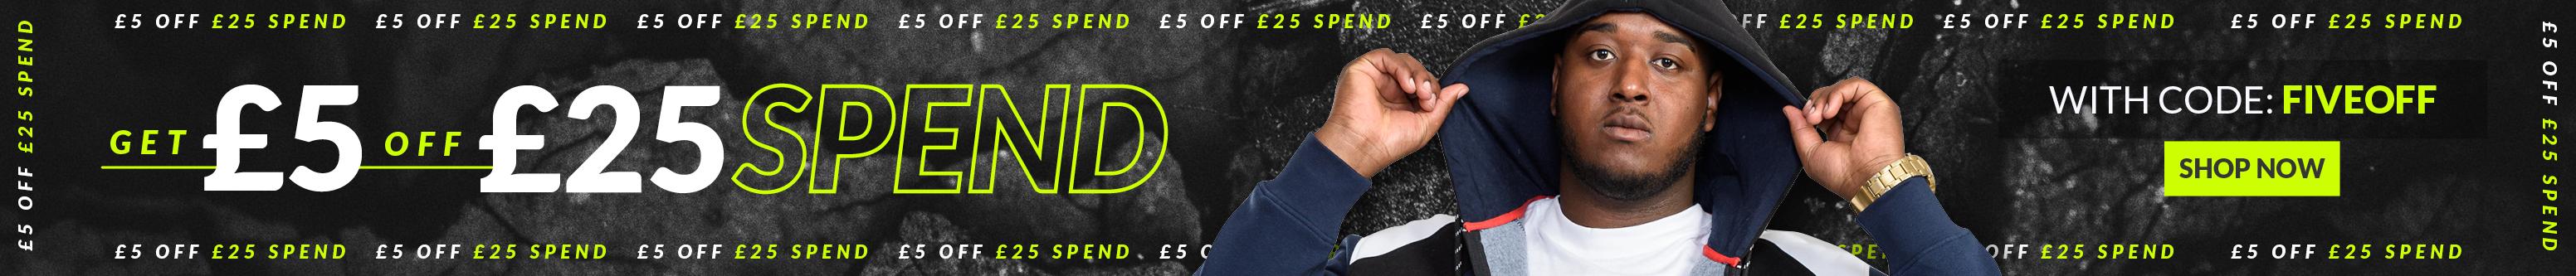 £5 OFF £25 SPEND